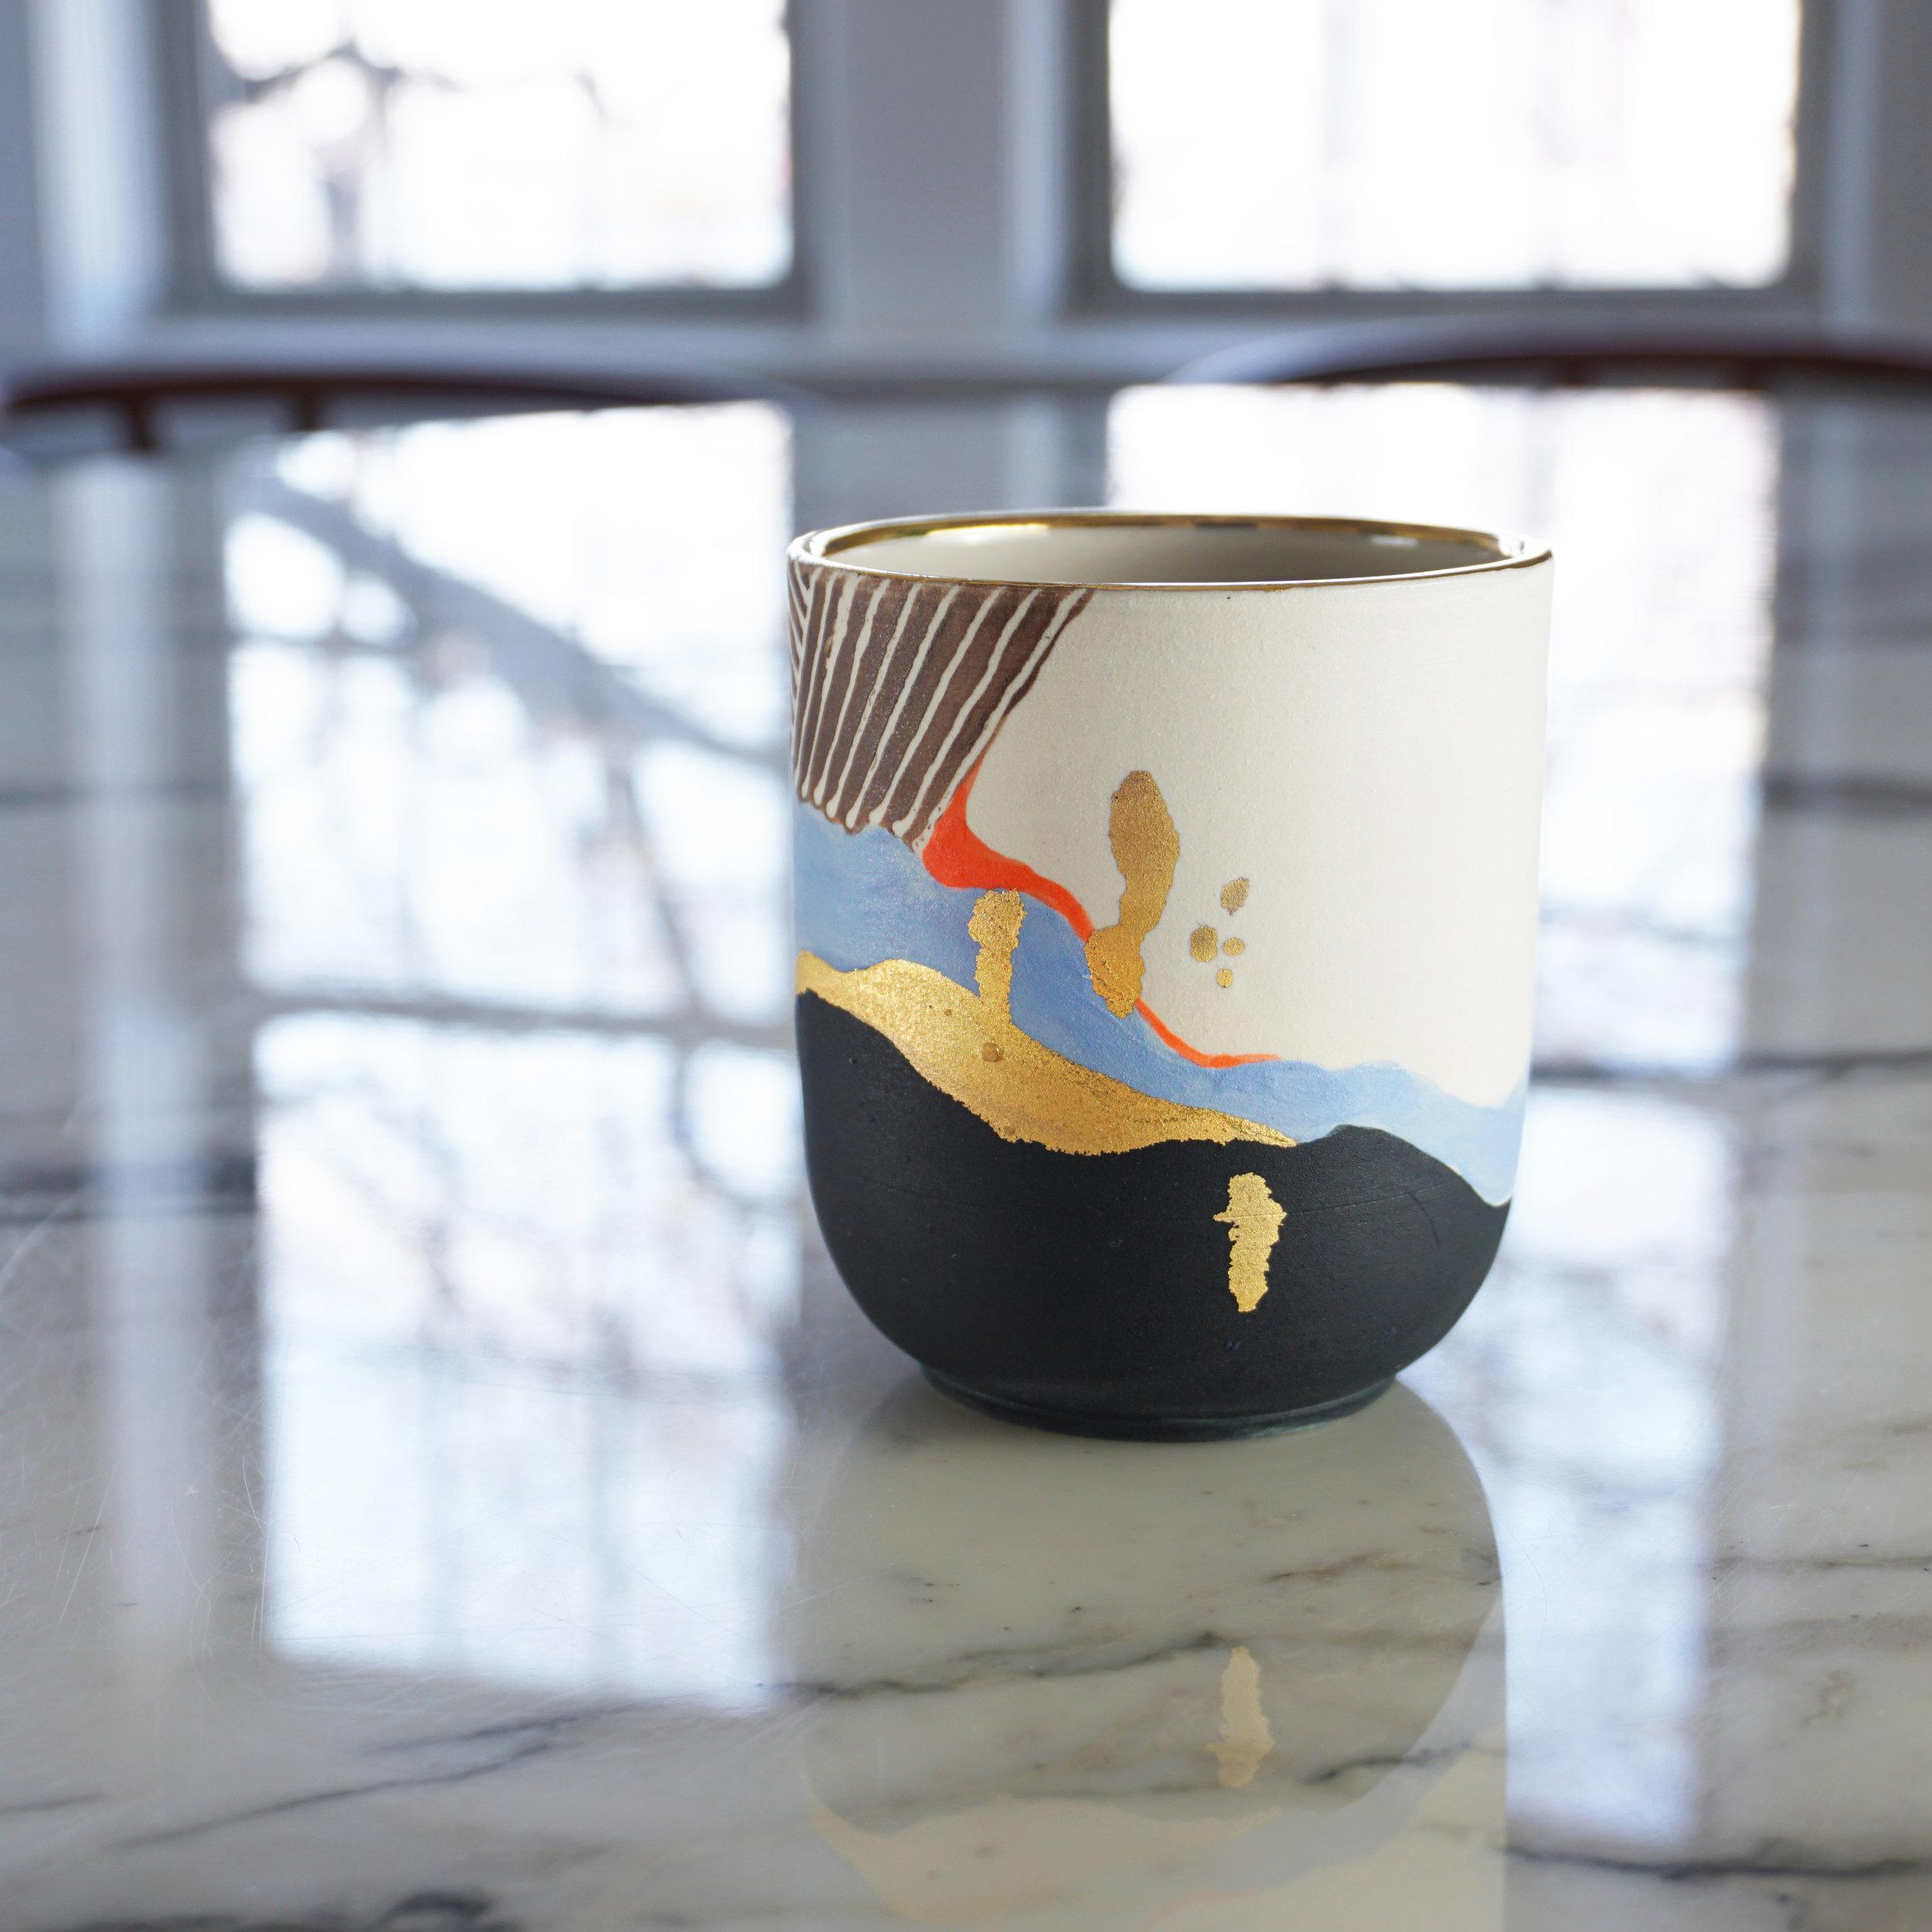 cup 1 table.jpg